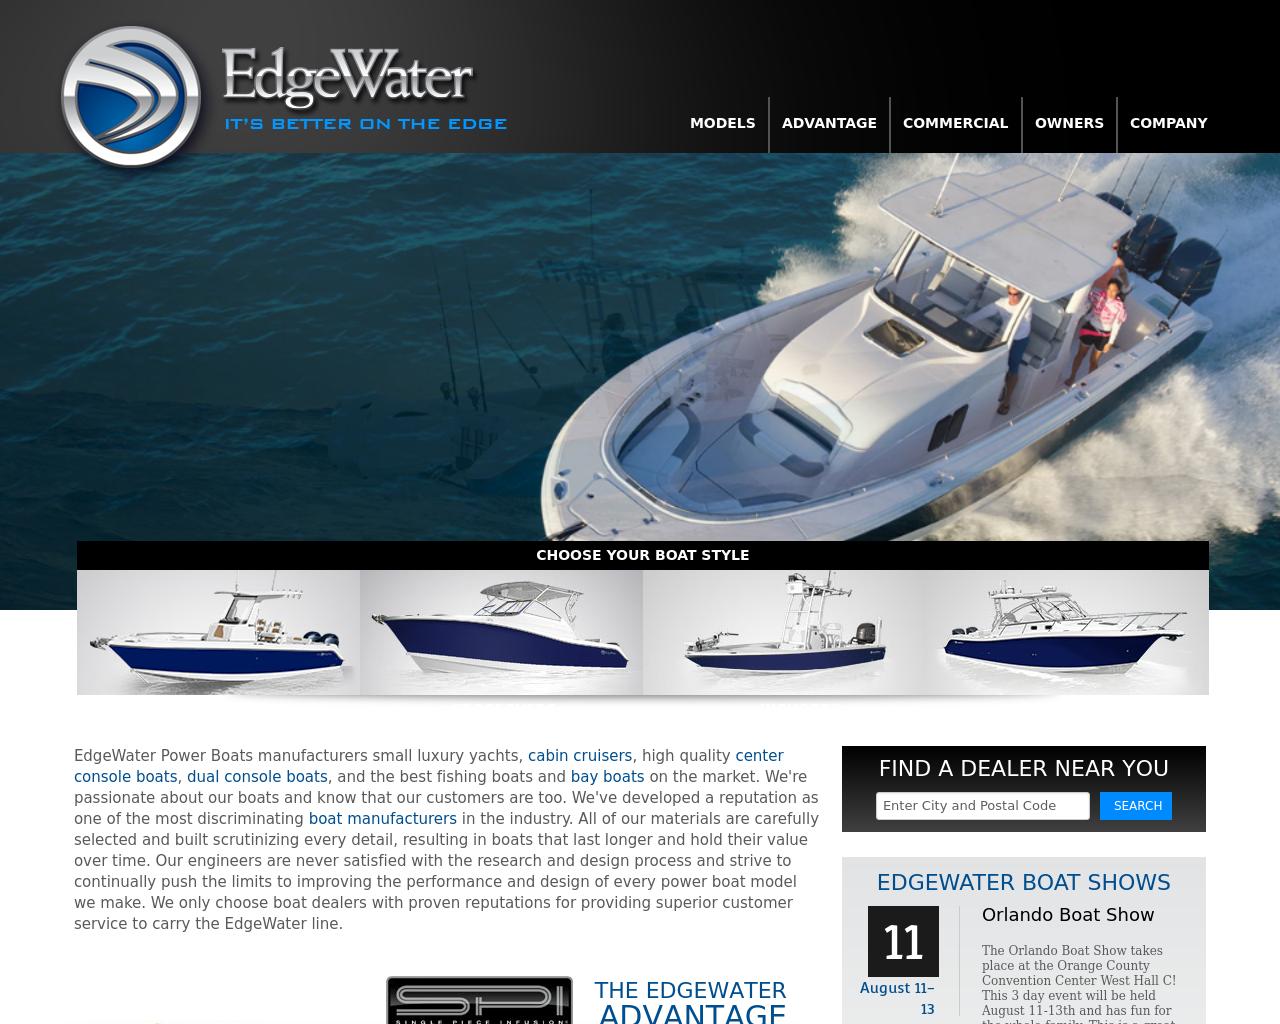 EdgeWater-Advertising-Reviews-Pricing